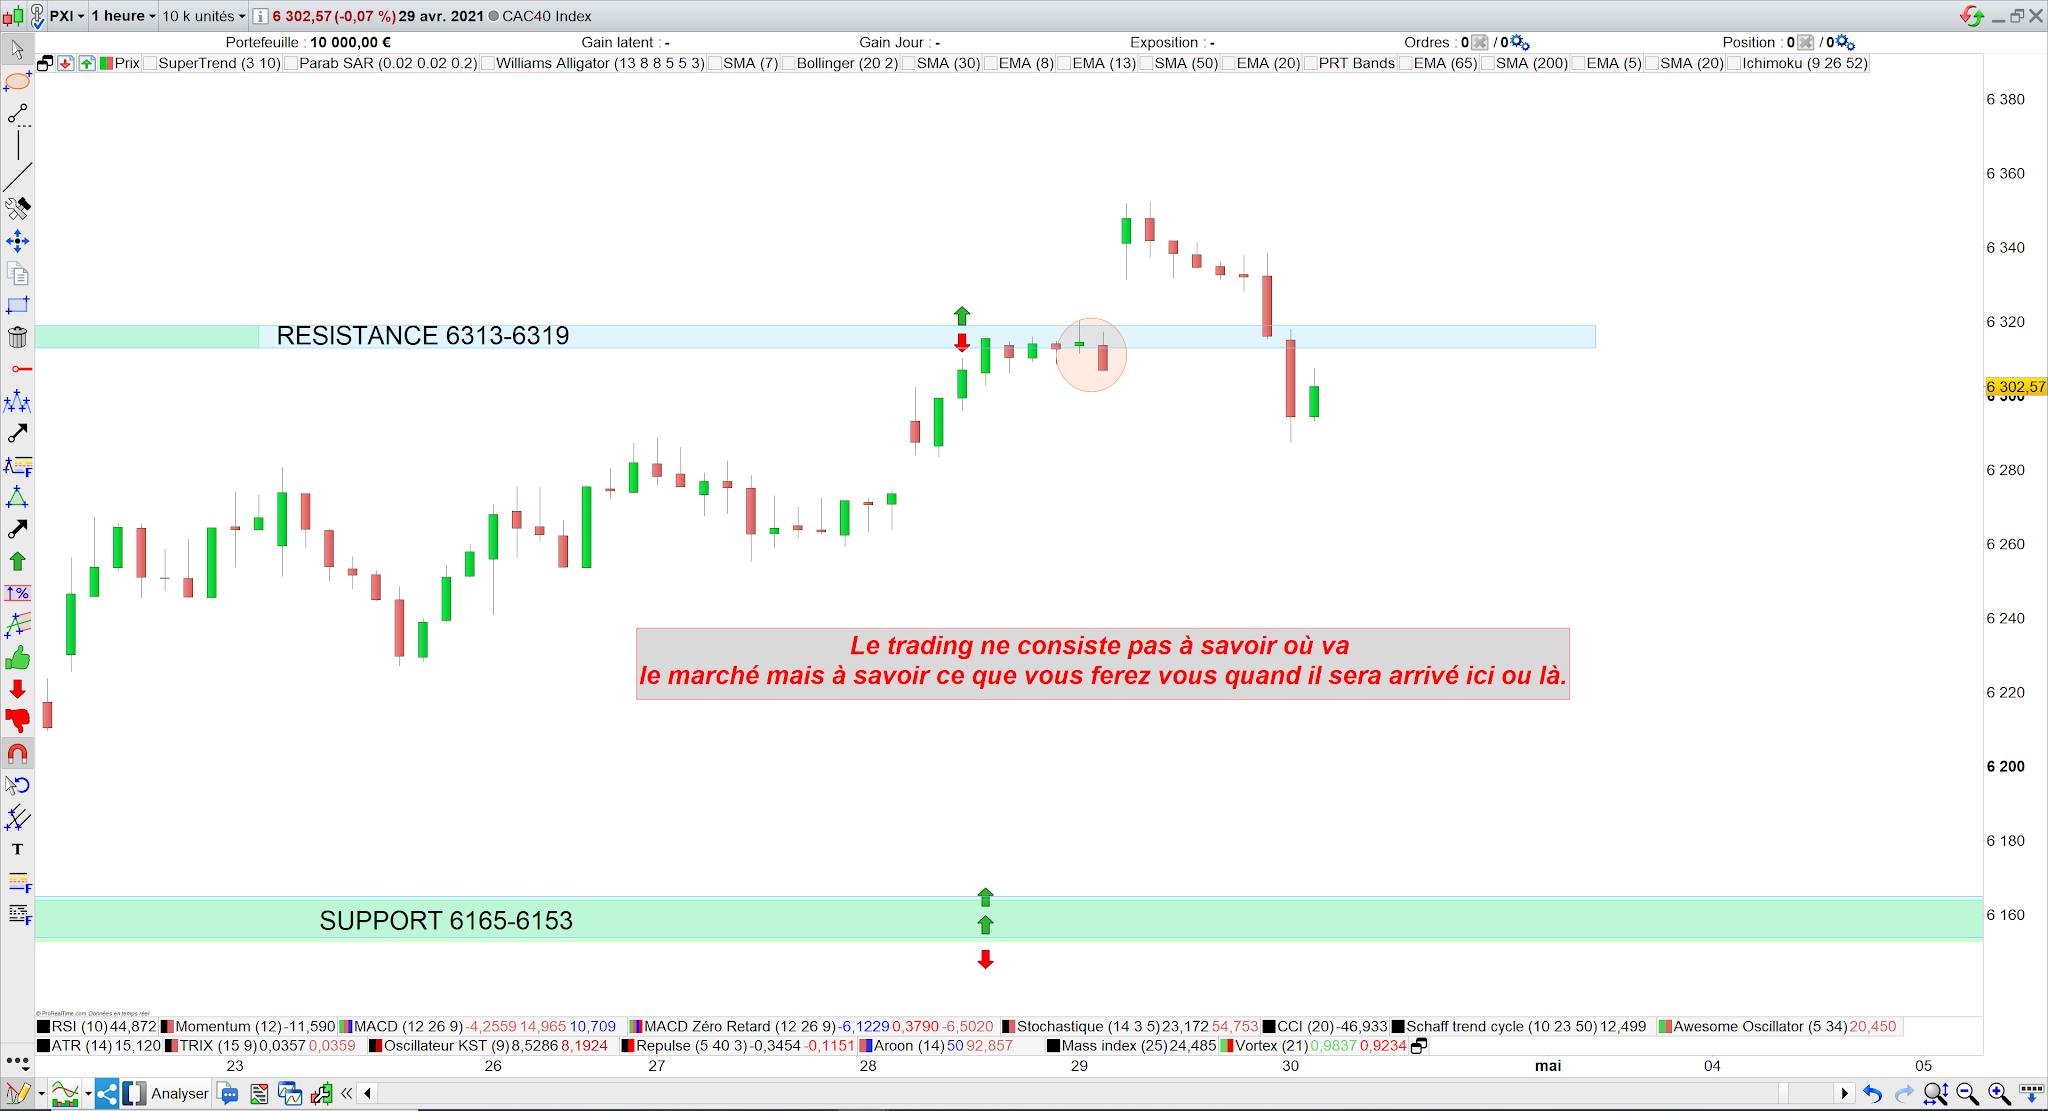 Trading cac 40 29 avril 21 bilan